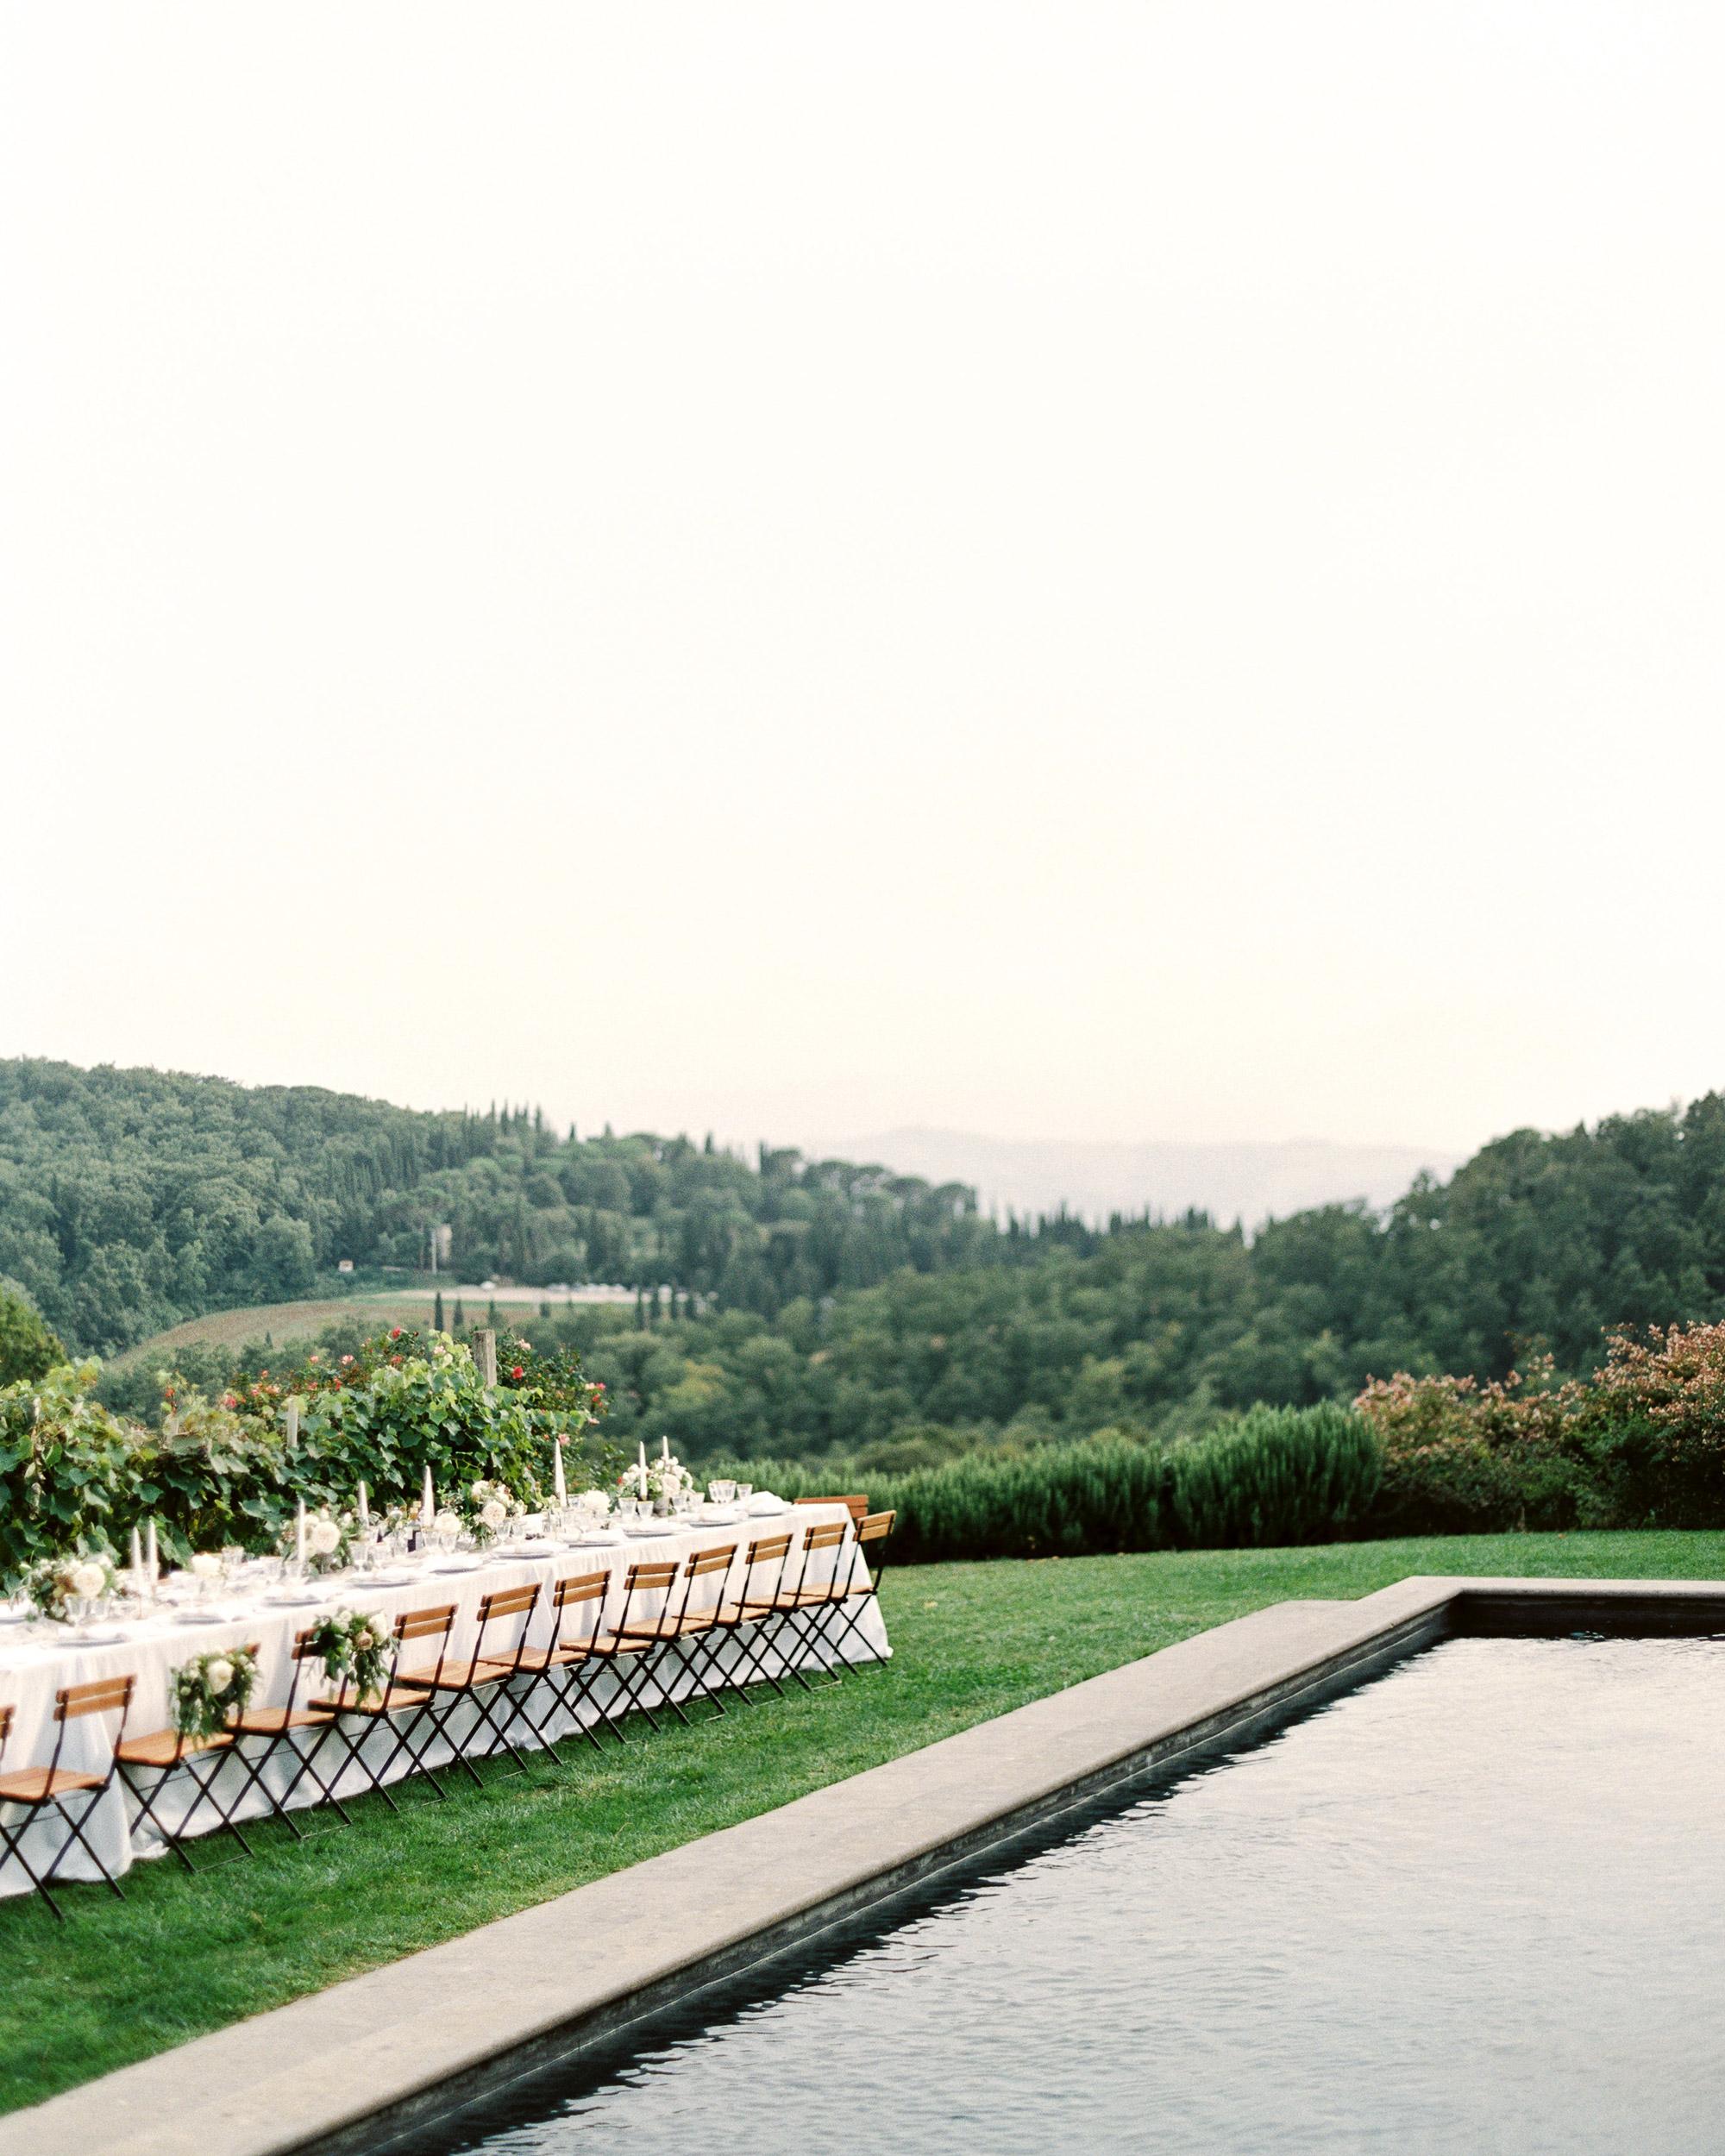 christine-dagan-wedding-reception-table-4280_07-s113011-0616.jpg